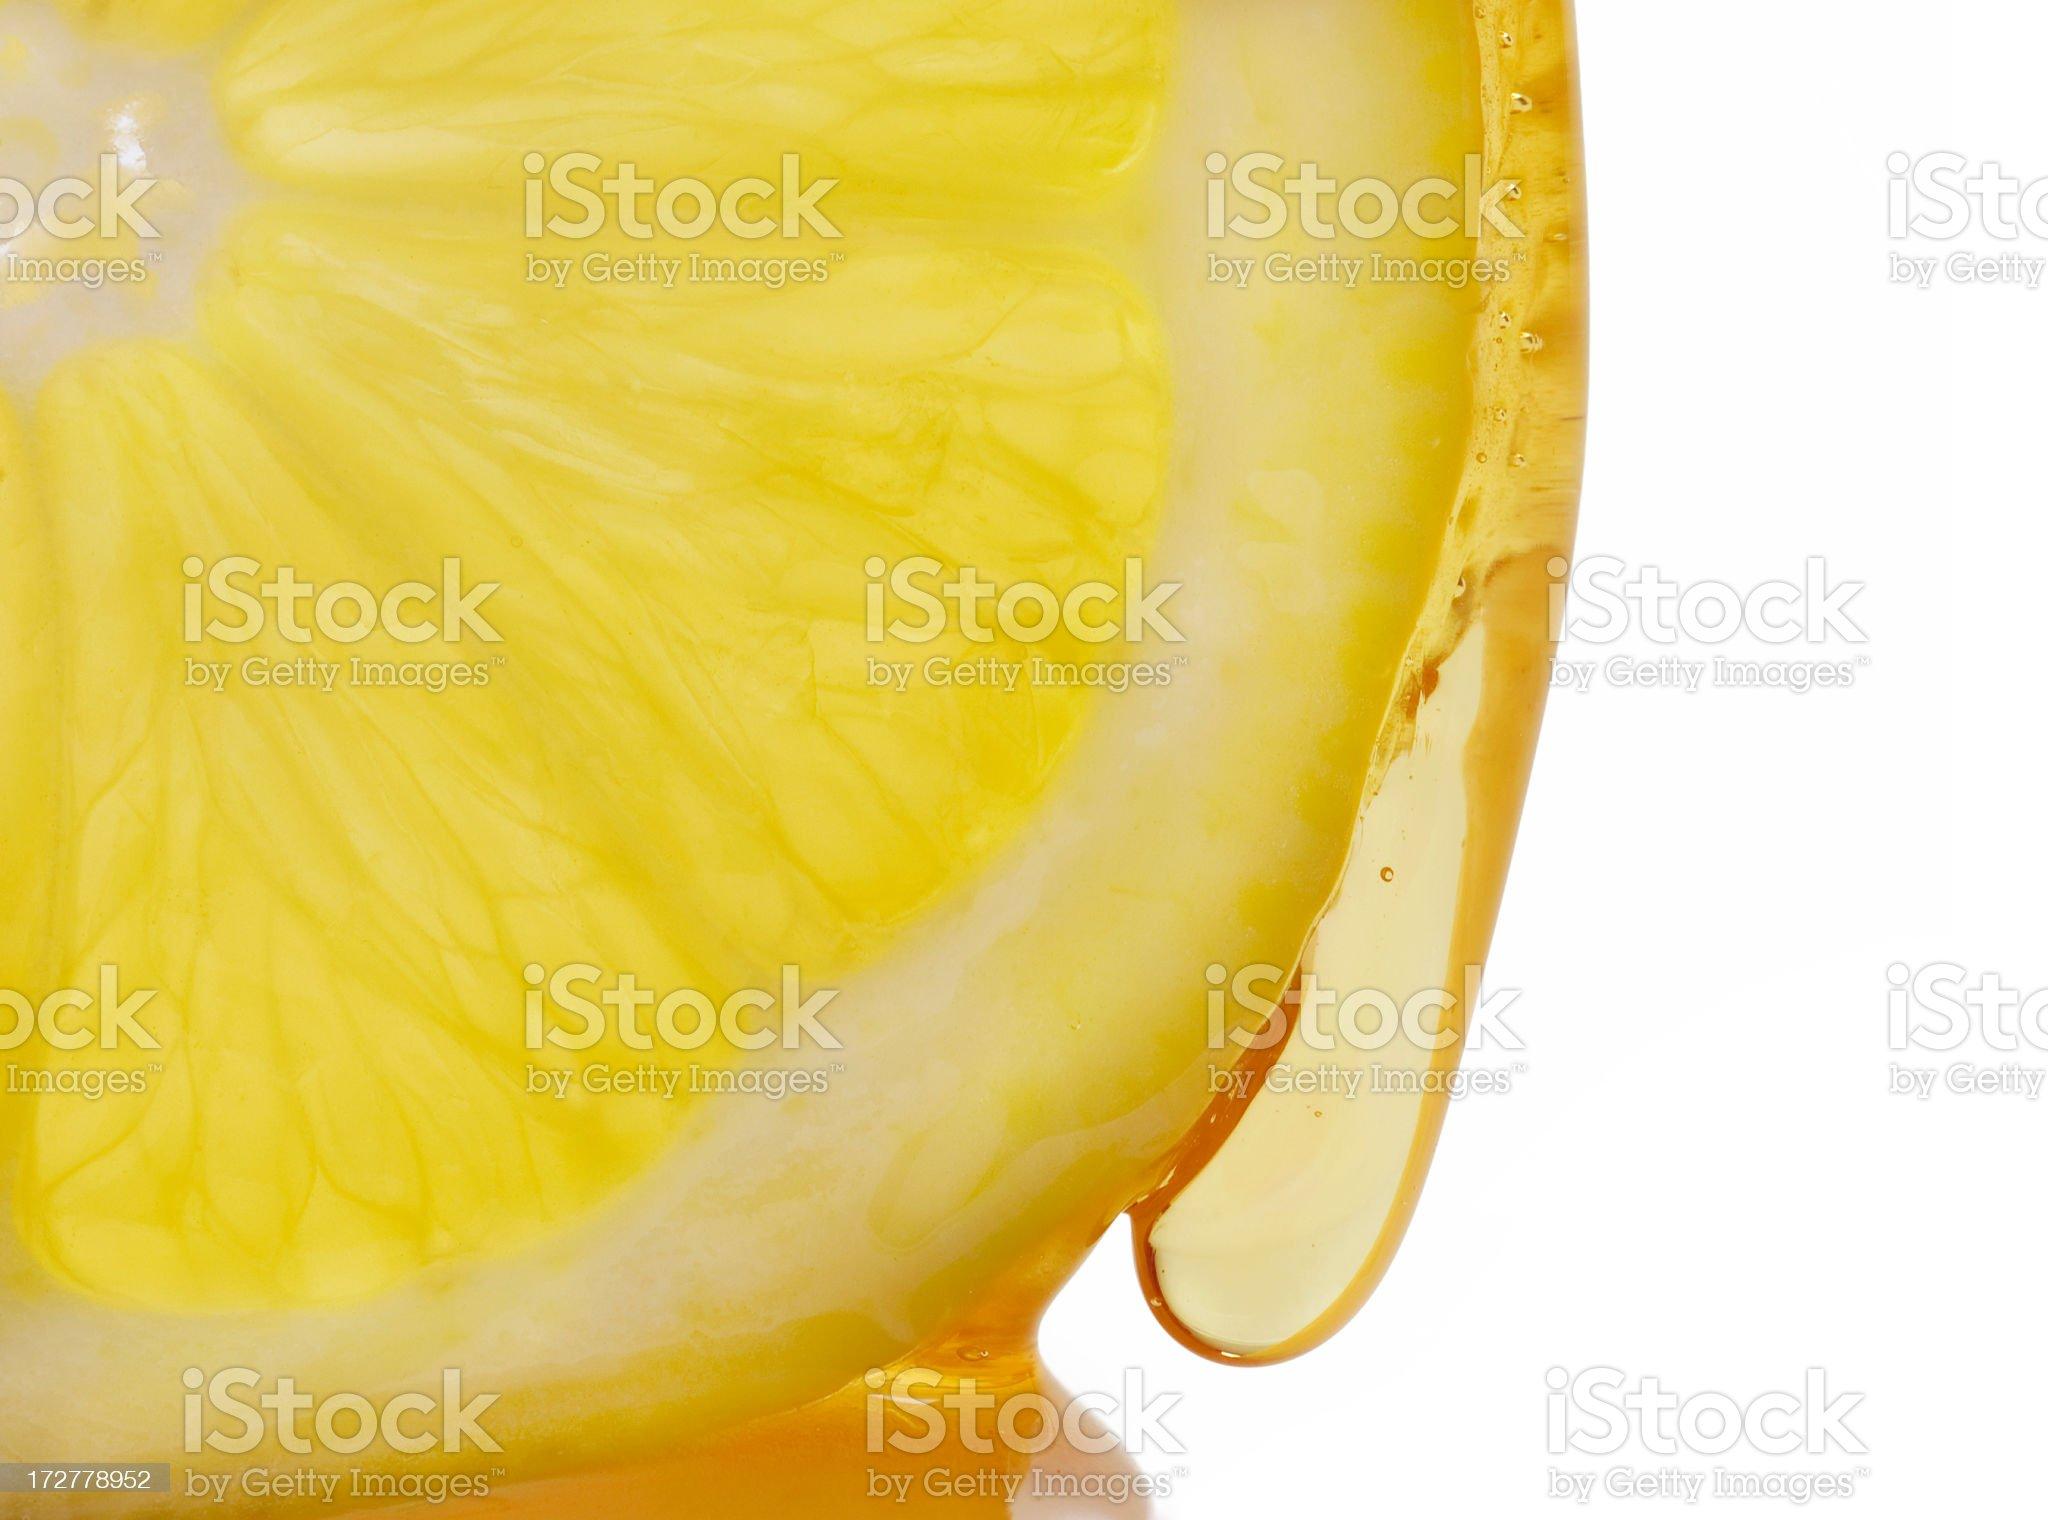 Lemon and Honey Drip royalty-free stock photo